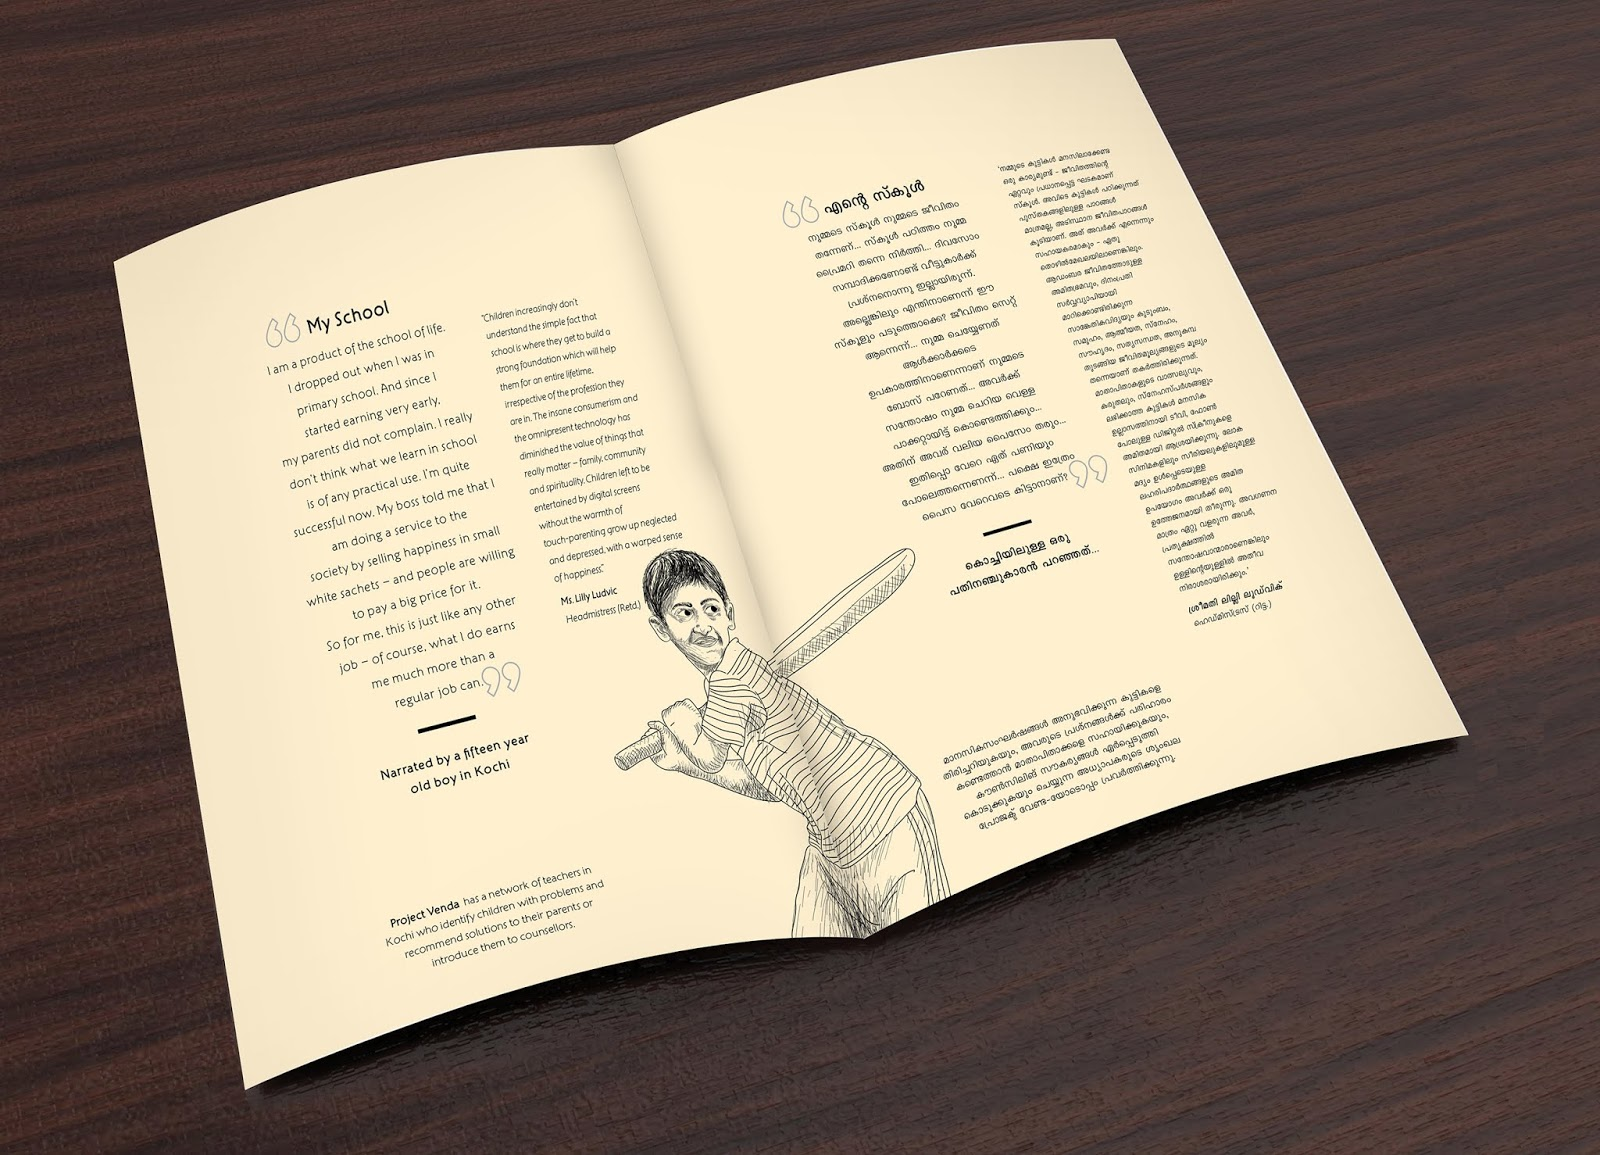 Project Venda - Fourth Wave Foundation | Brochure Mock-up - 04 | Stark Communications Pvt Ltd